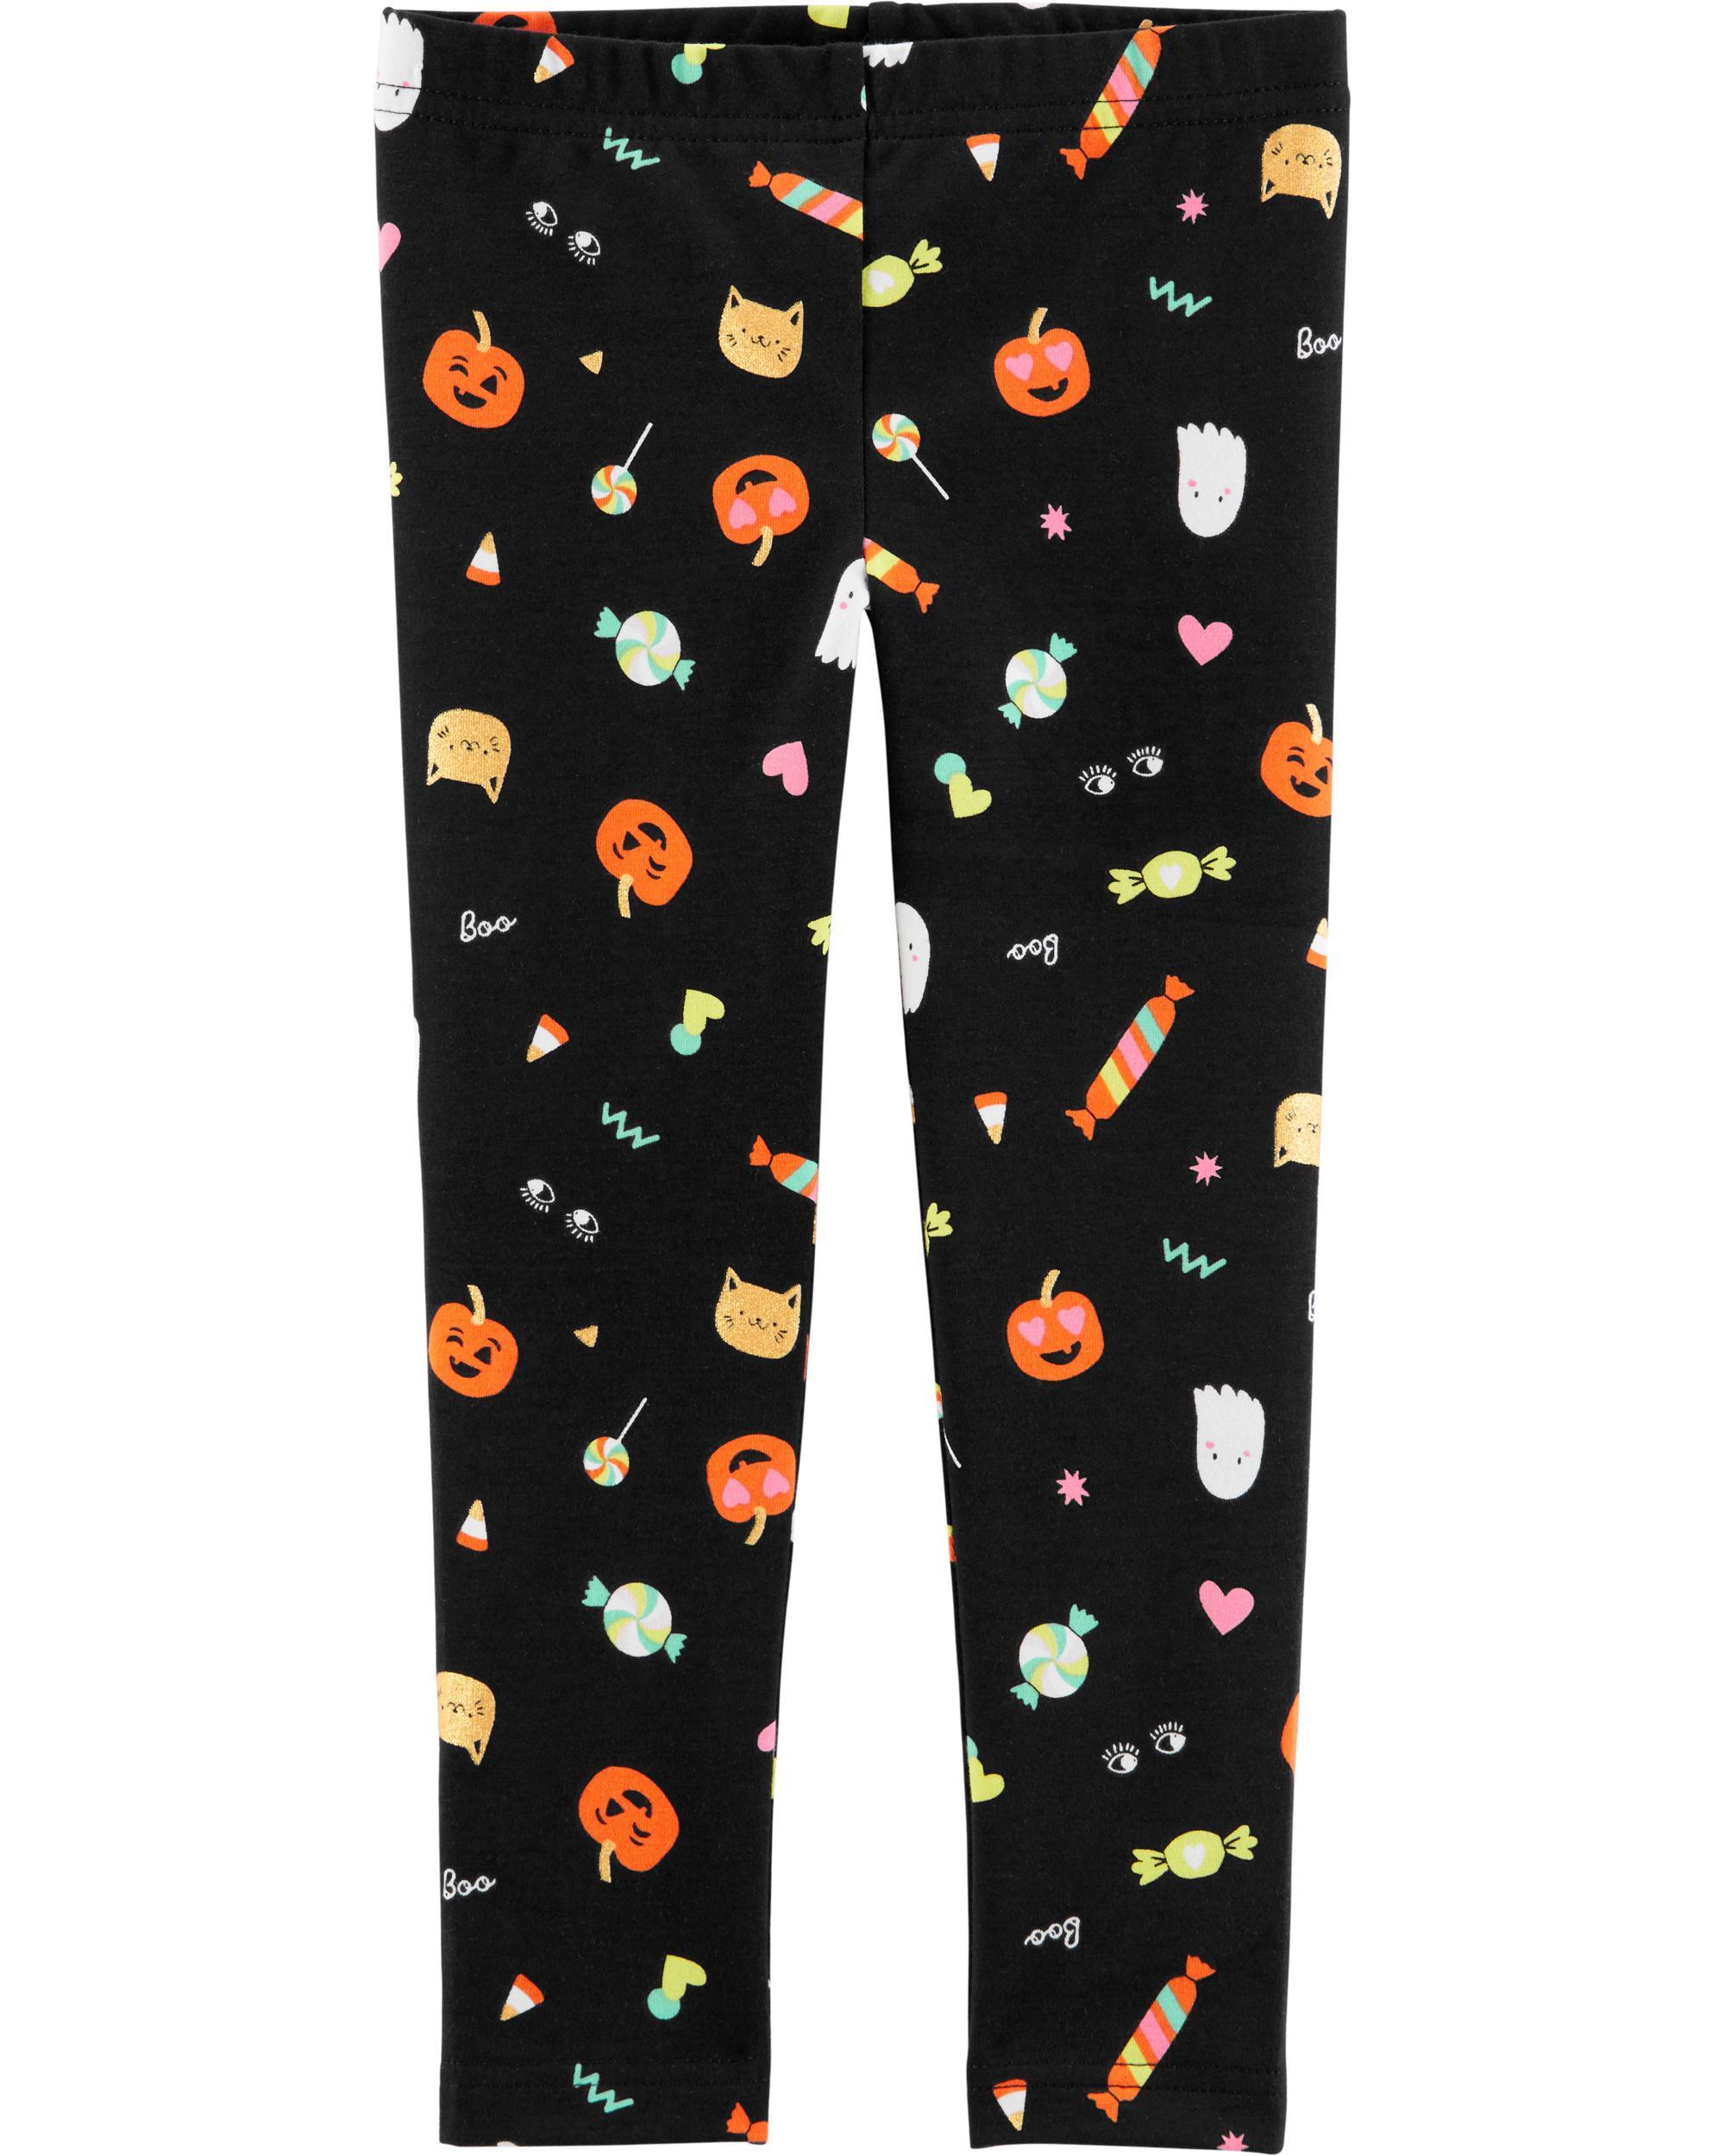 Happy Ghost Black Halloween Baby Shirt Leggings 4 Preemie and Newborn Sizes